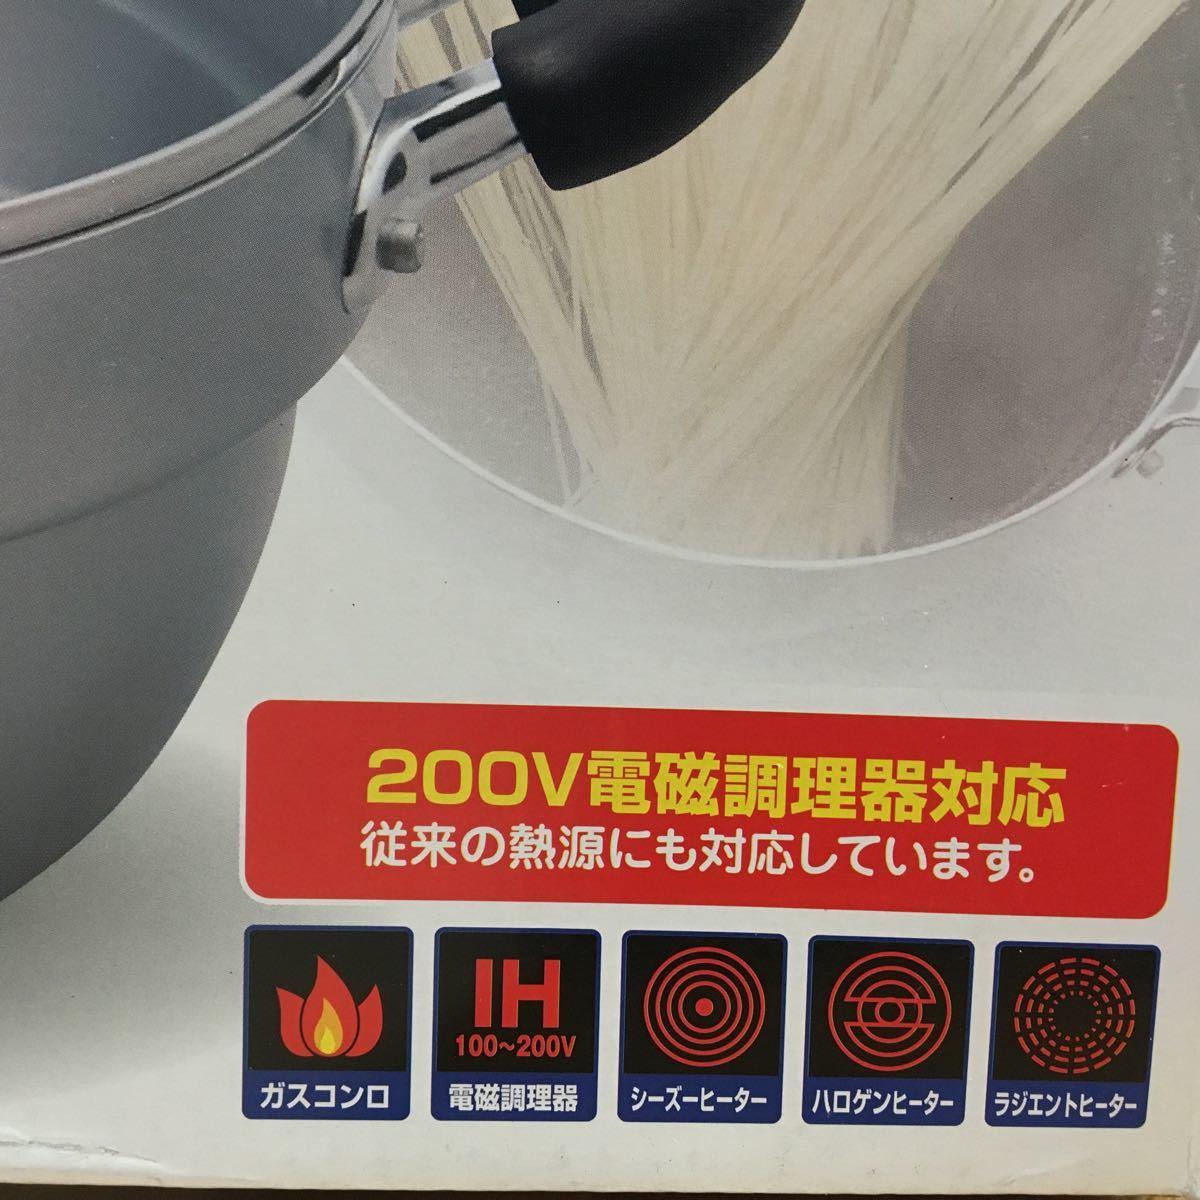 IH対応段付兼用鍋26cm(目皿付き) VDN-26 フッ素加工 両手鍋 未使用